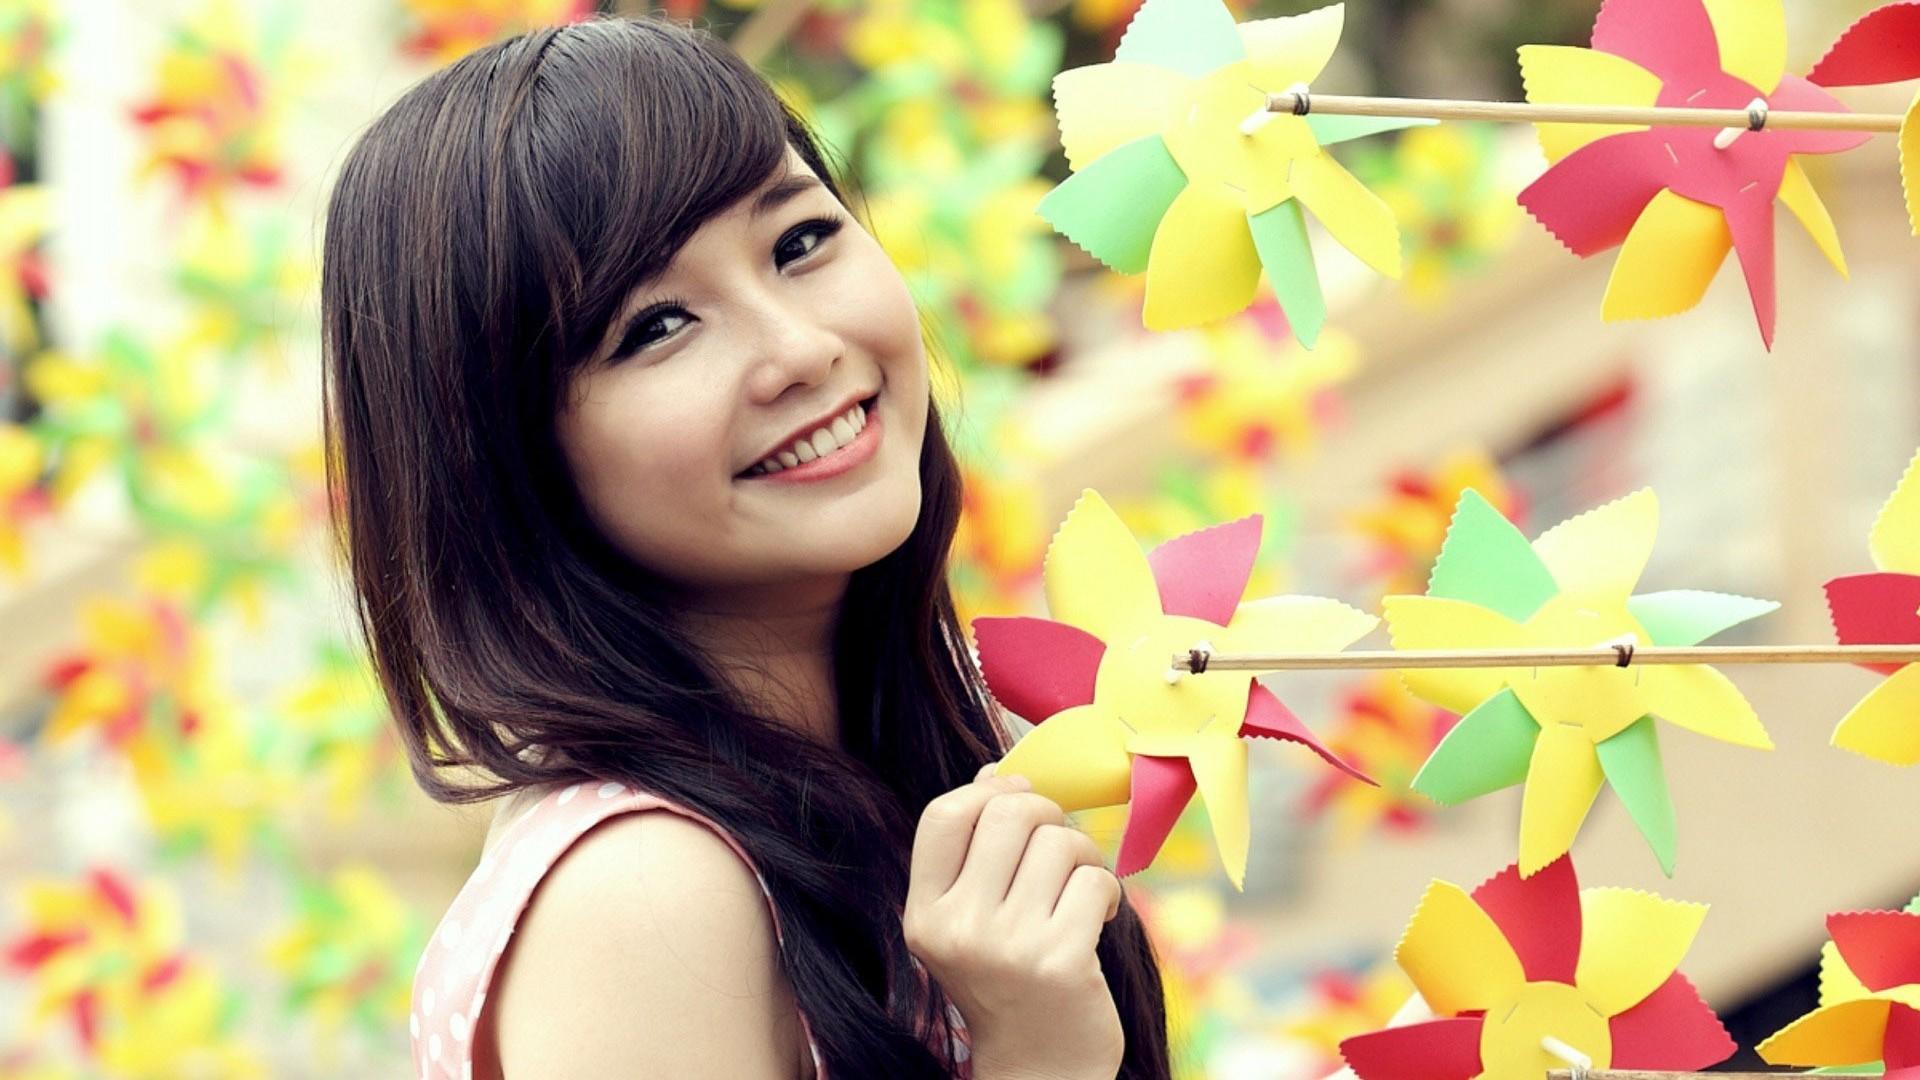 … Top 20+ Pretty Asian Girl Sexy Pics Cute, Computer As Wallpaper